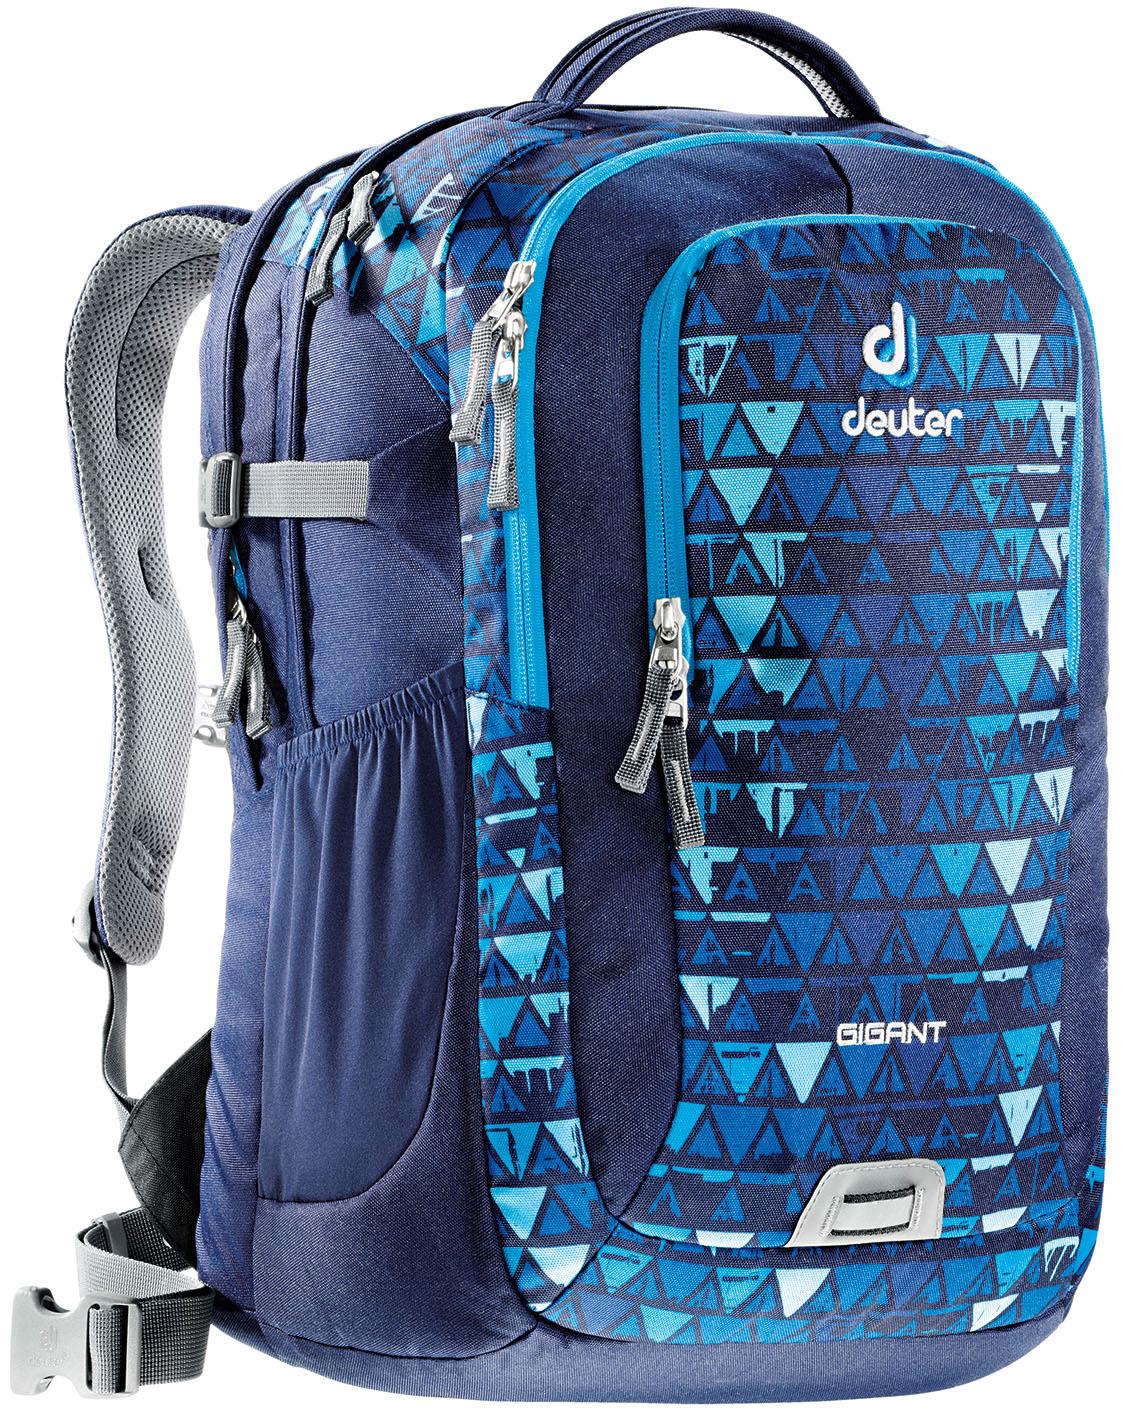 Рюкзак Deuter 2015 Daypacks Gigant, цвет: синий, 32 л